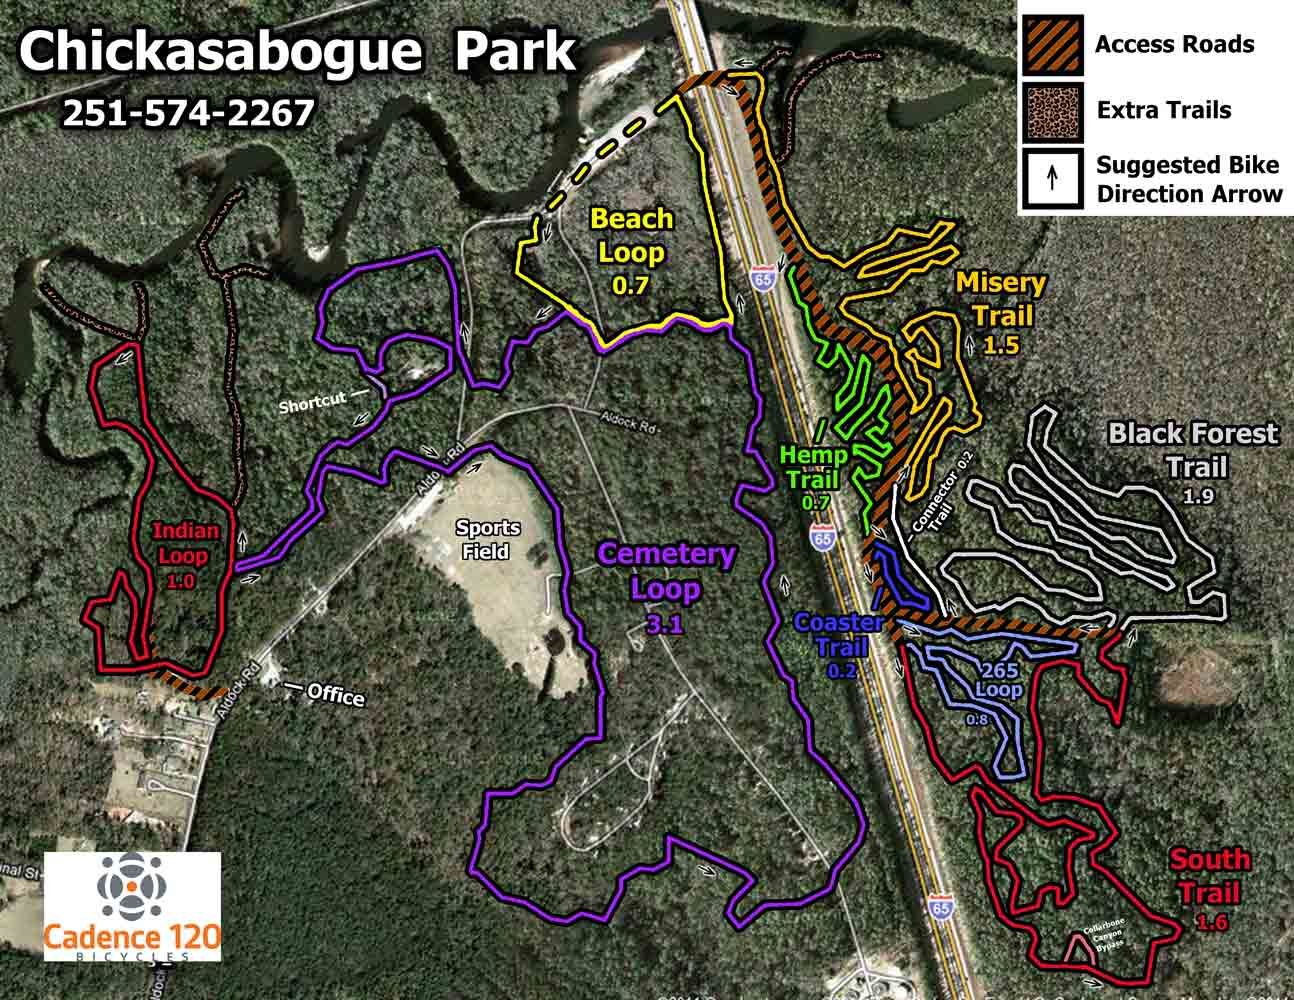 Chickasabouge Park - Mountain Bike Trails